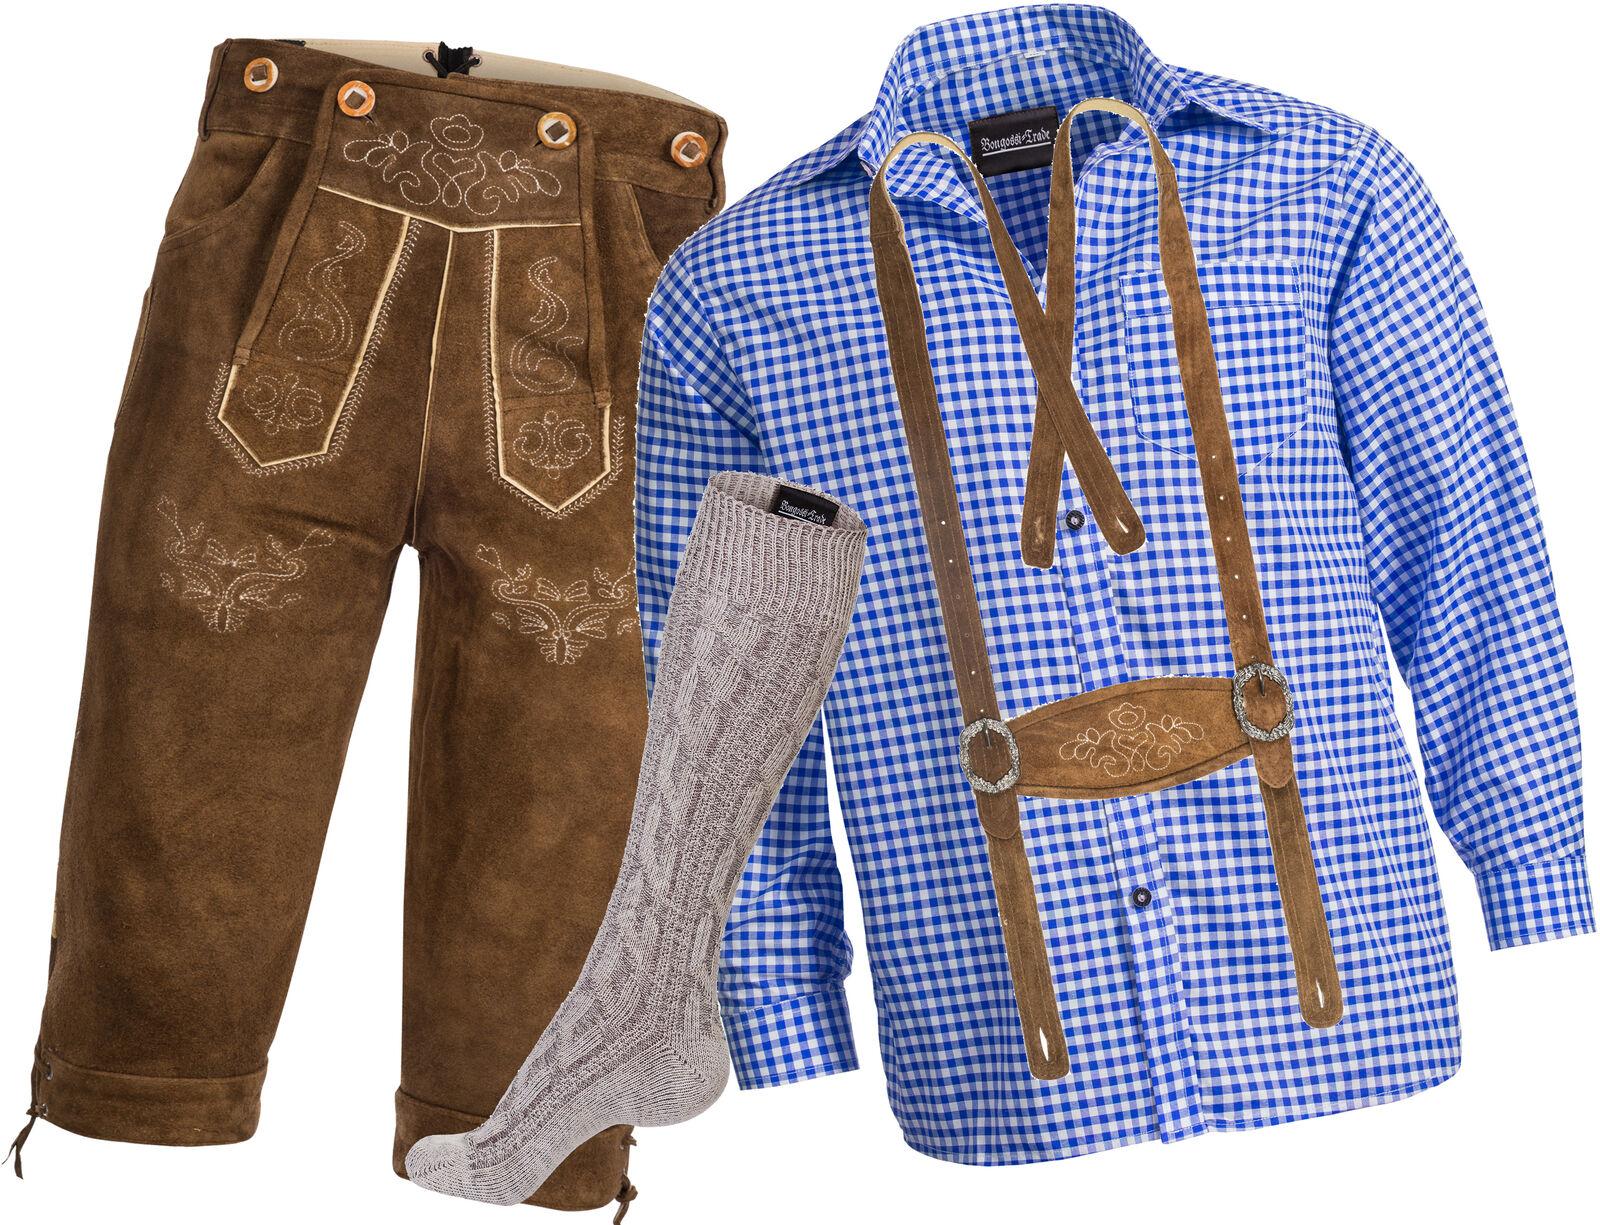 Herren Trachten Set Lederhose m. Trägern rehbraun + Trachtenhemd blau + Strümpfe